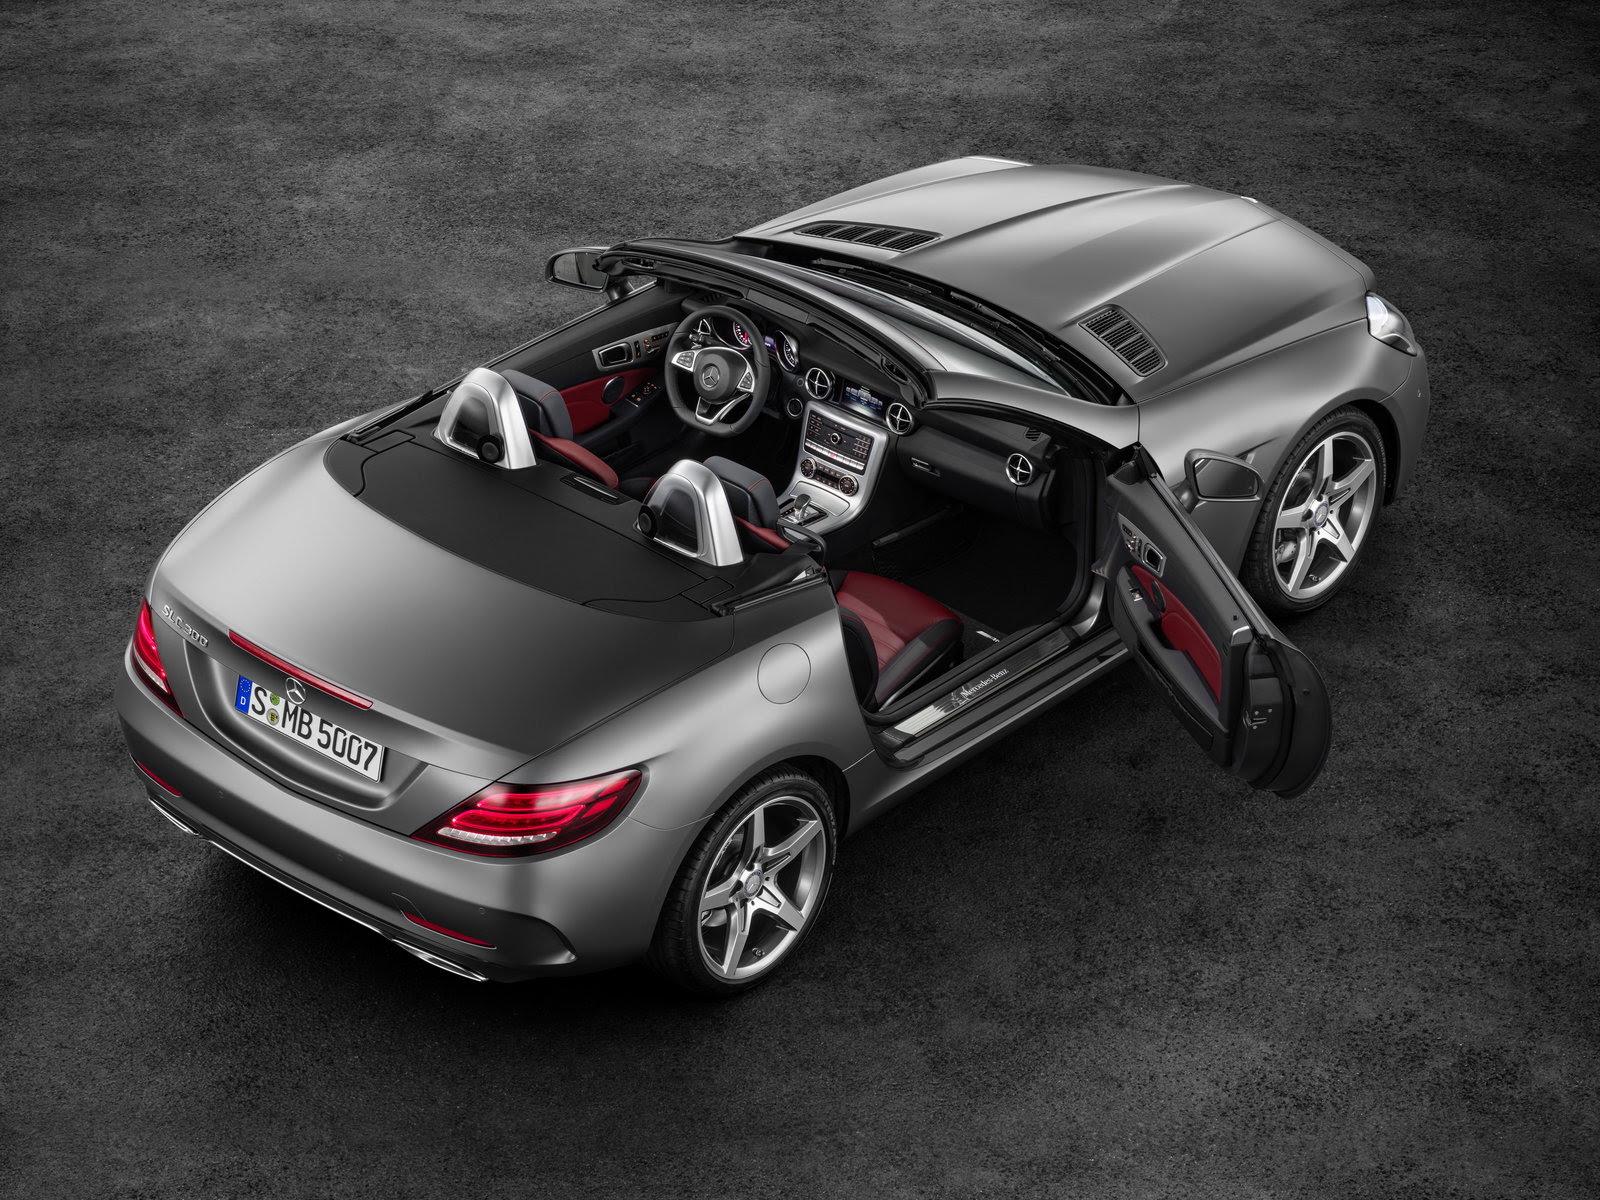 2017 Mercedes-Benz SLC300 Deals, Prices, Incentives ...